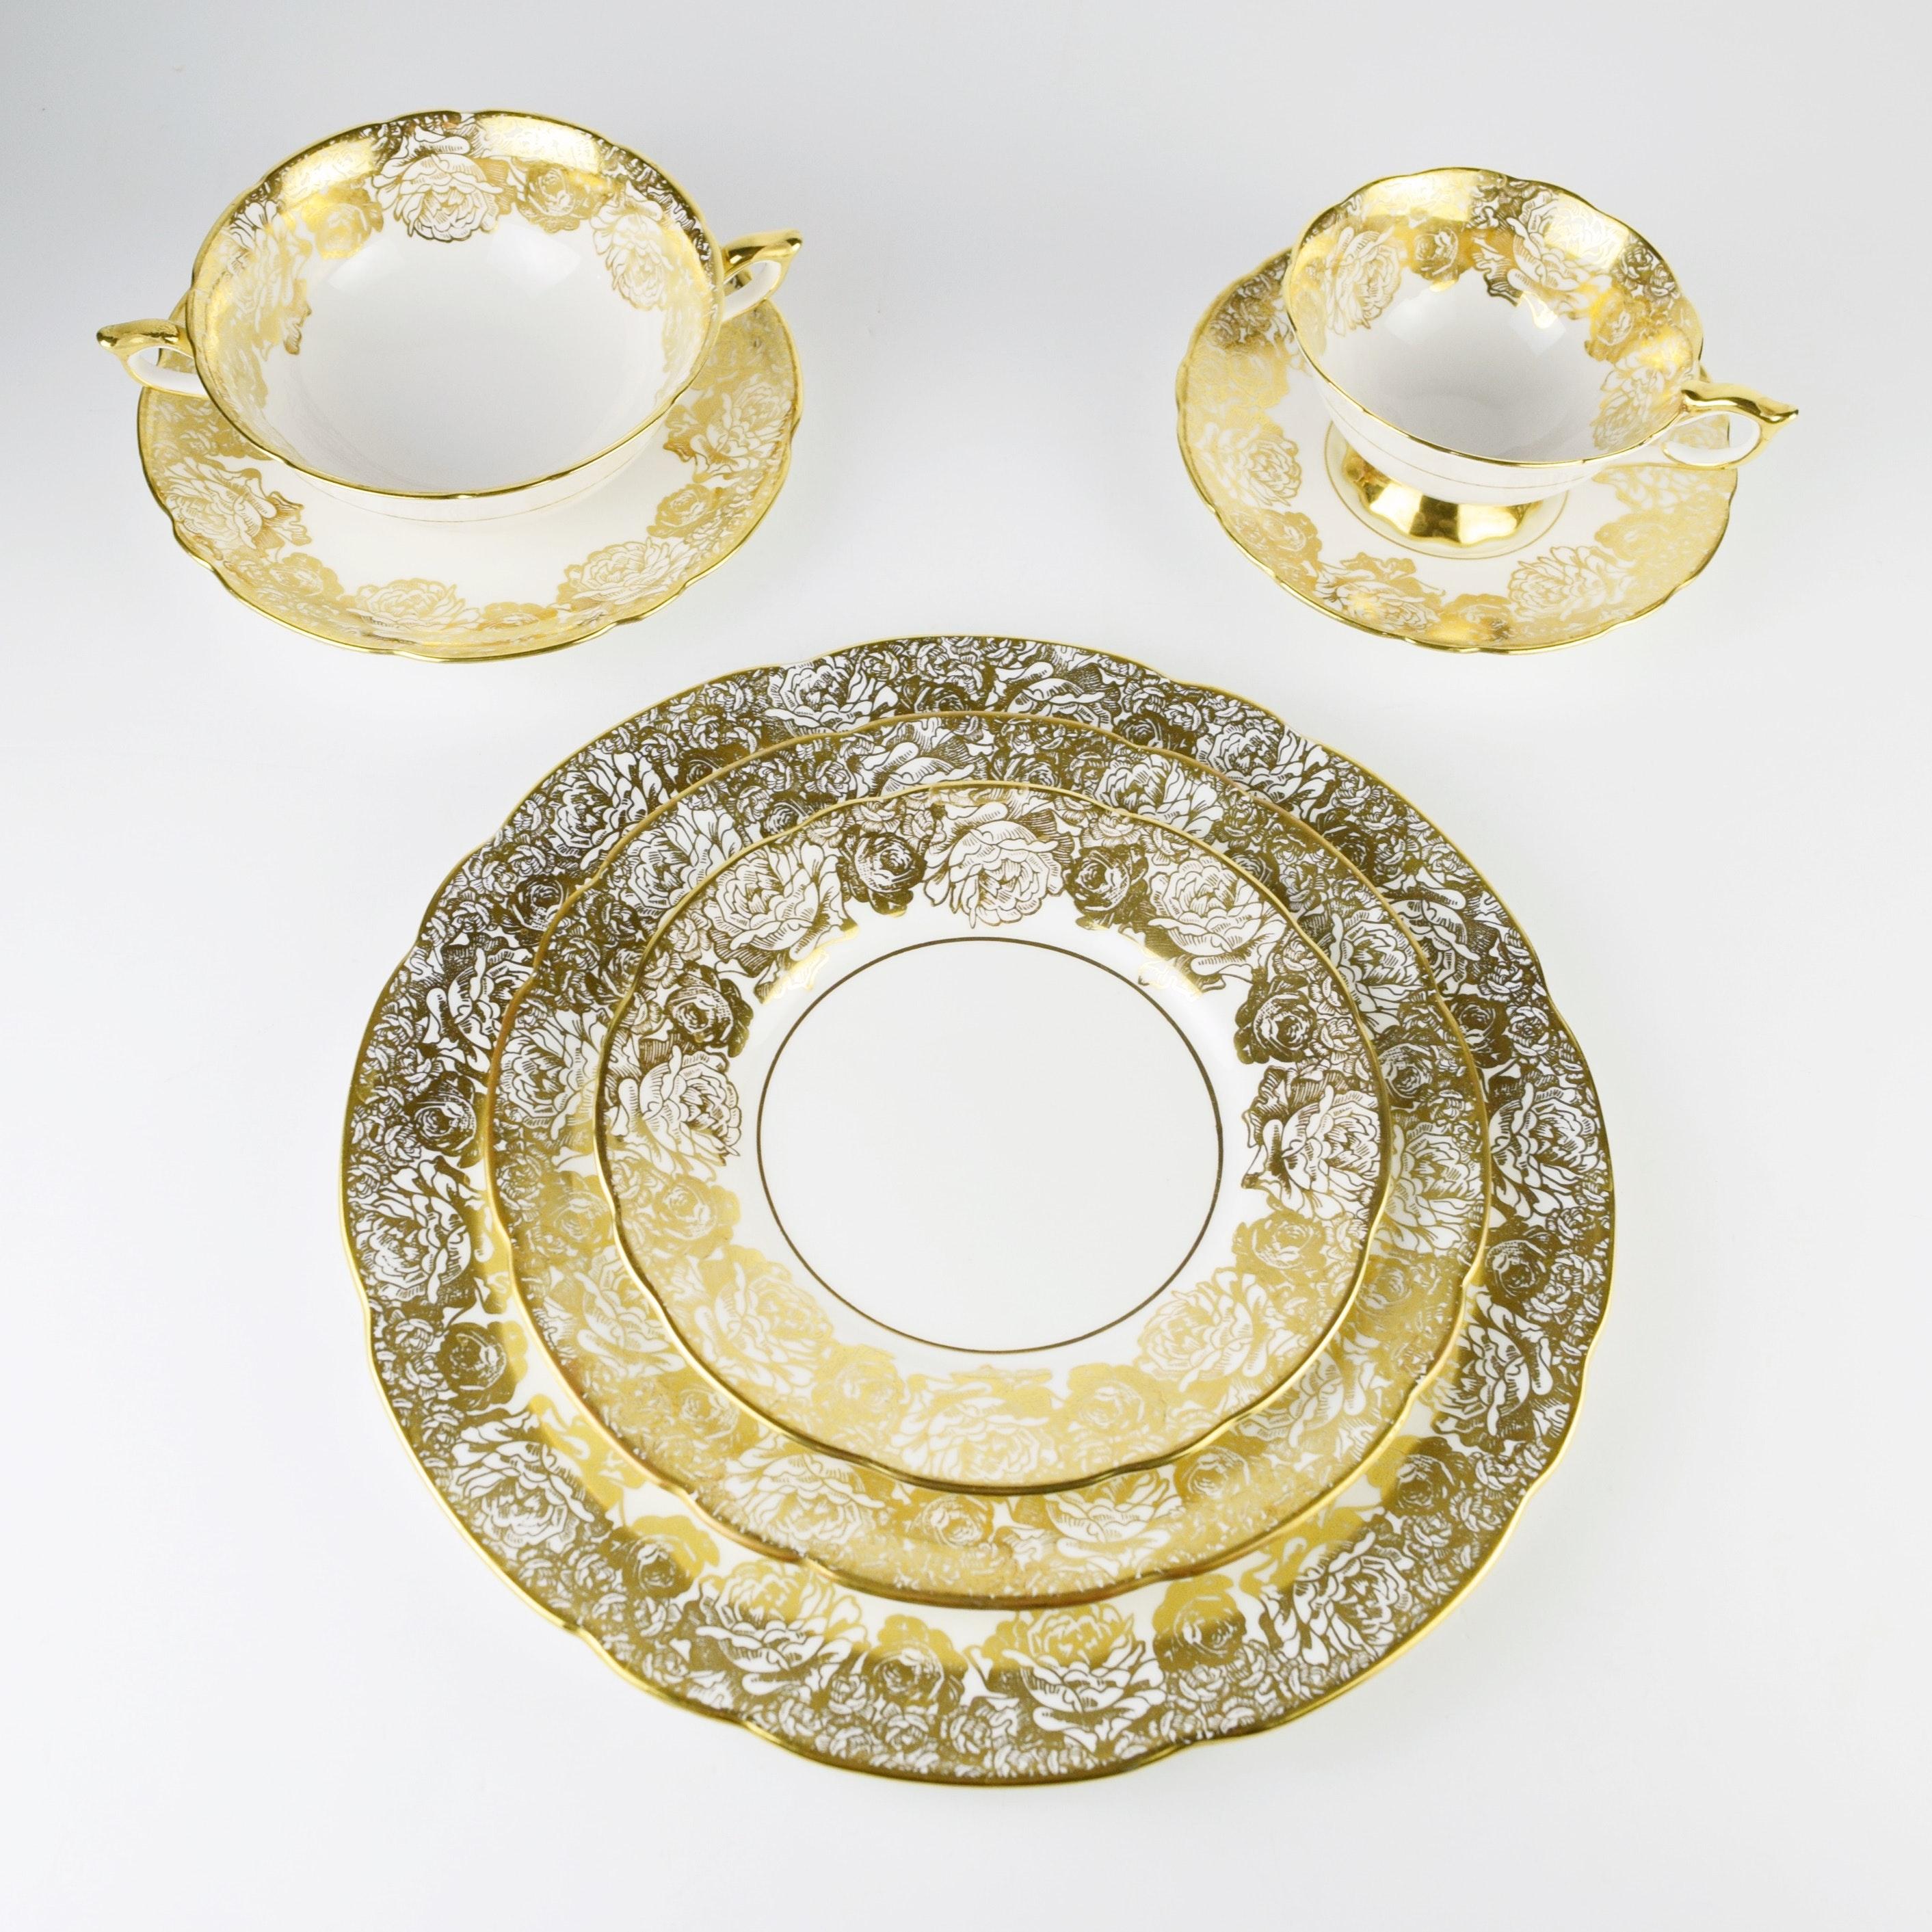 Royal Stafford  Golden Bouquet  English Bone China Dinnerware ...  sc 1 st  EBTH.com & Royal Stafford